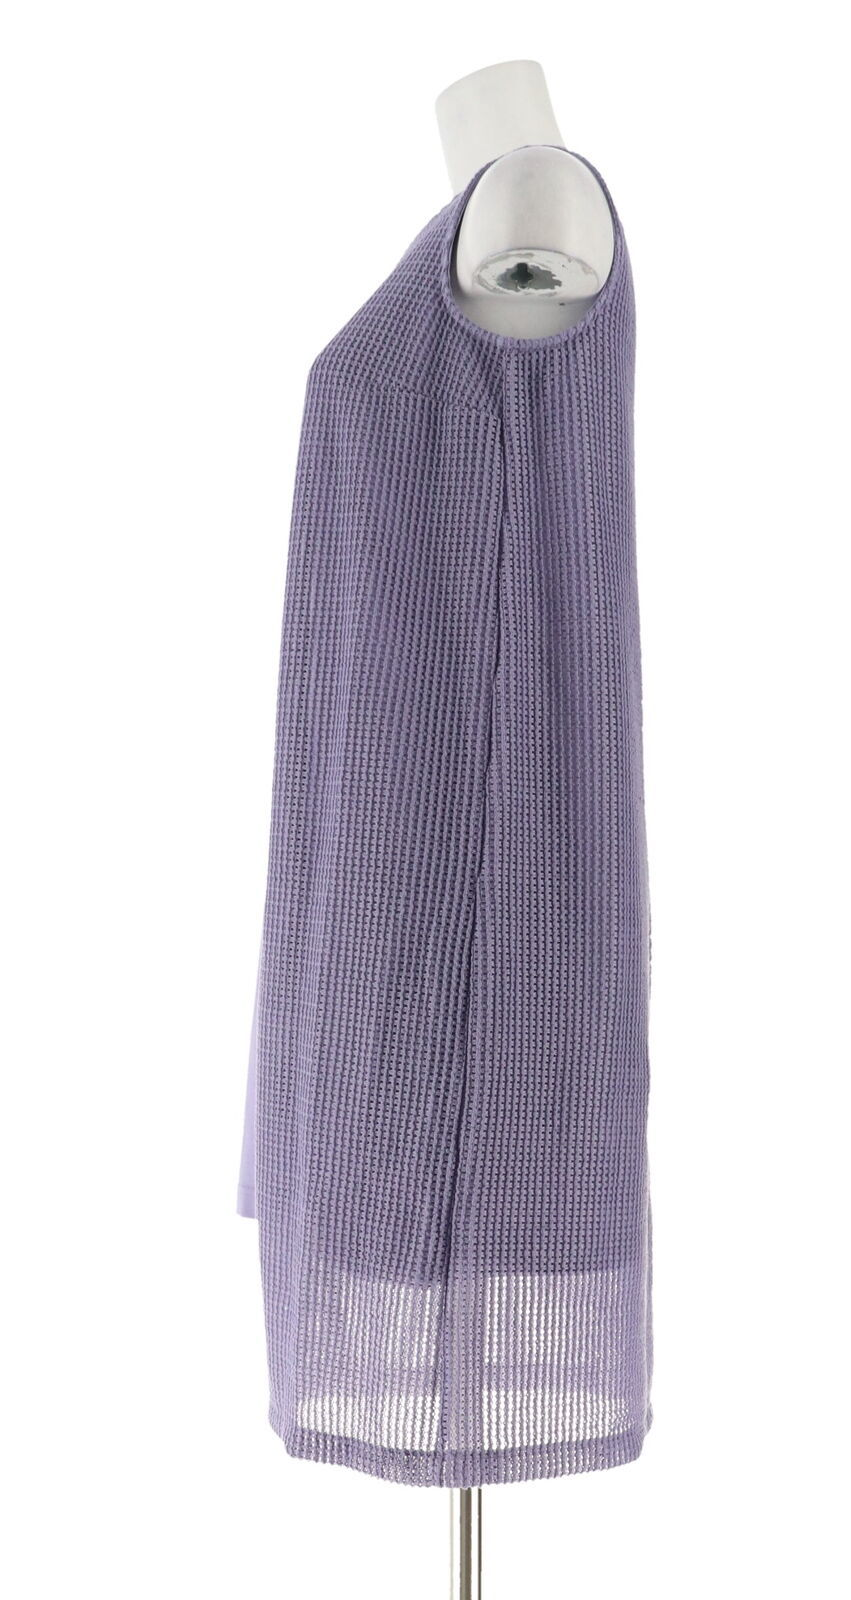 Halston Petite Slvless Knit Midi Dress Knit Overlay Violet Blush 4P NEW A288612